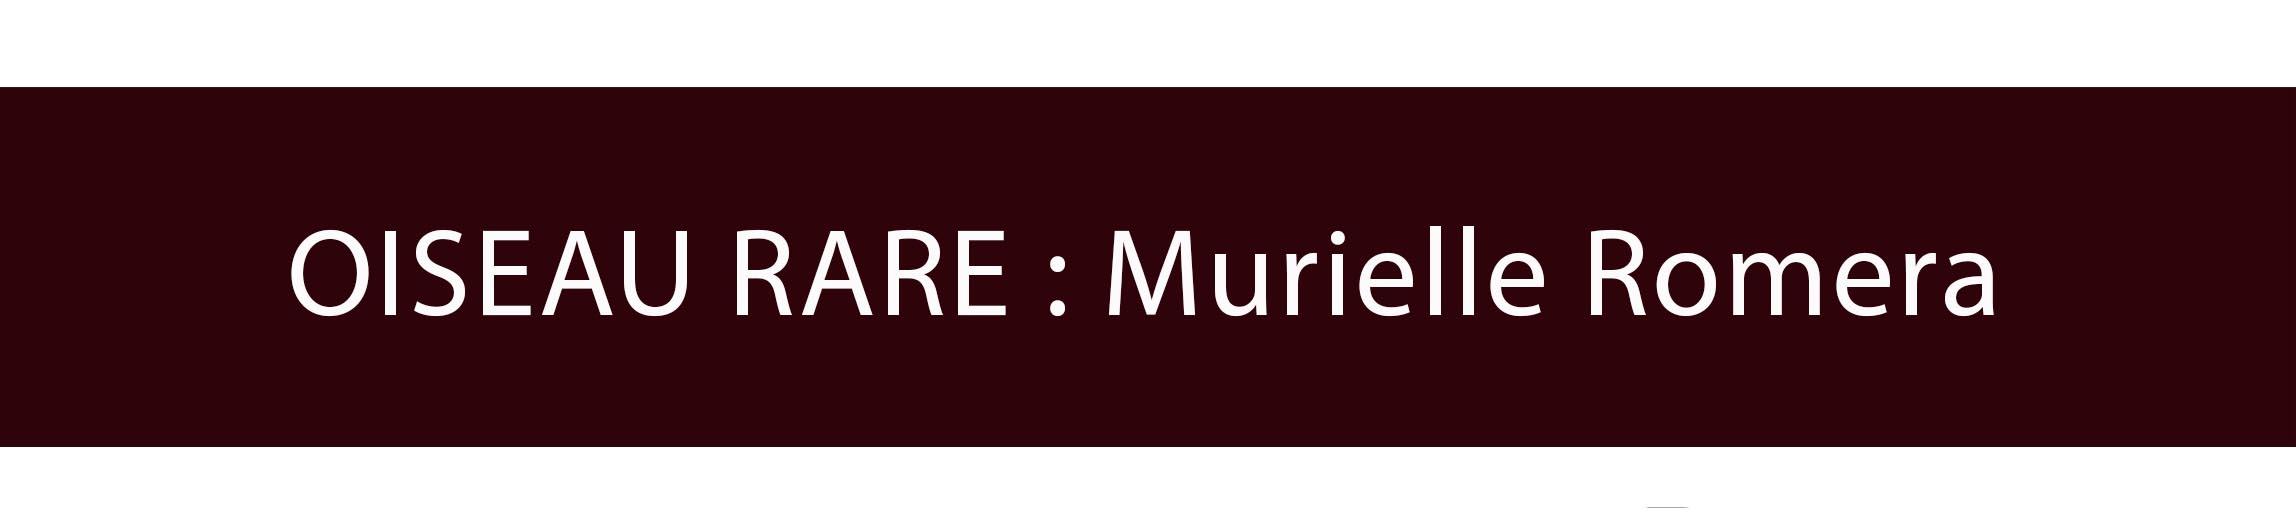 bandeau artisan Murielle romera espèce protégée